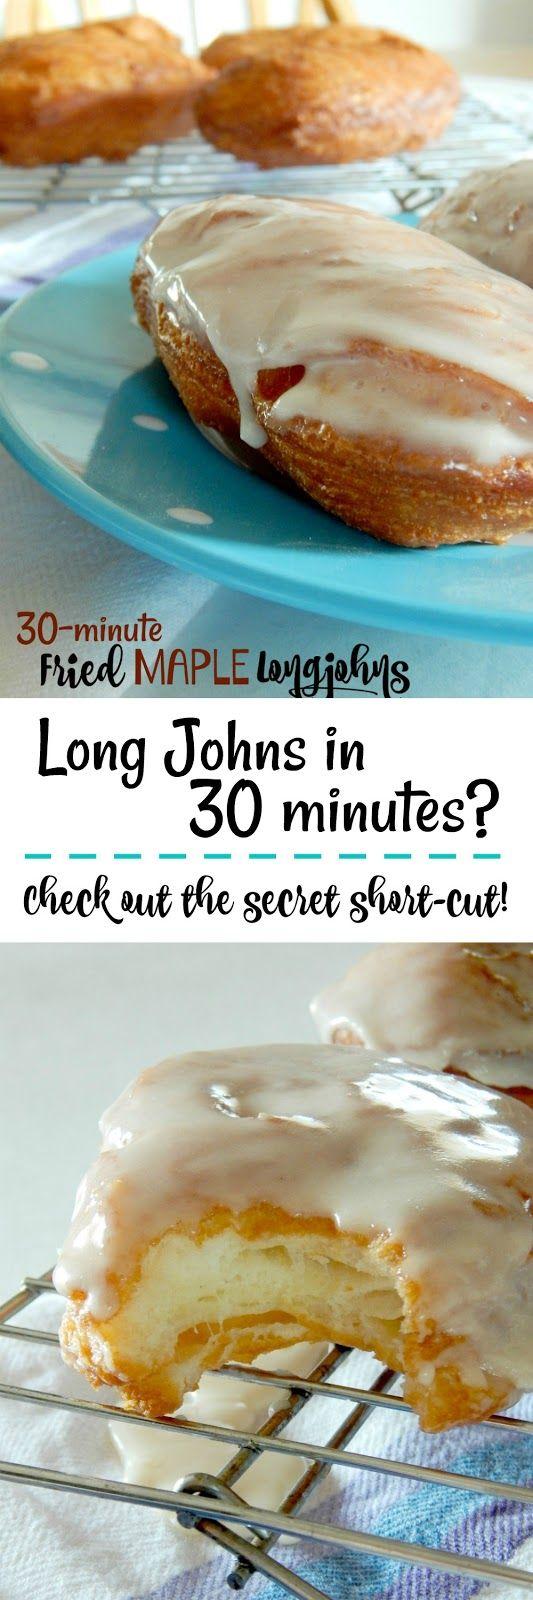 30-Minute Fried Maple Long Johns...a new short-cut…